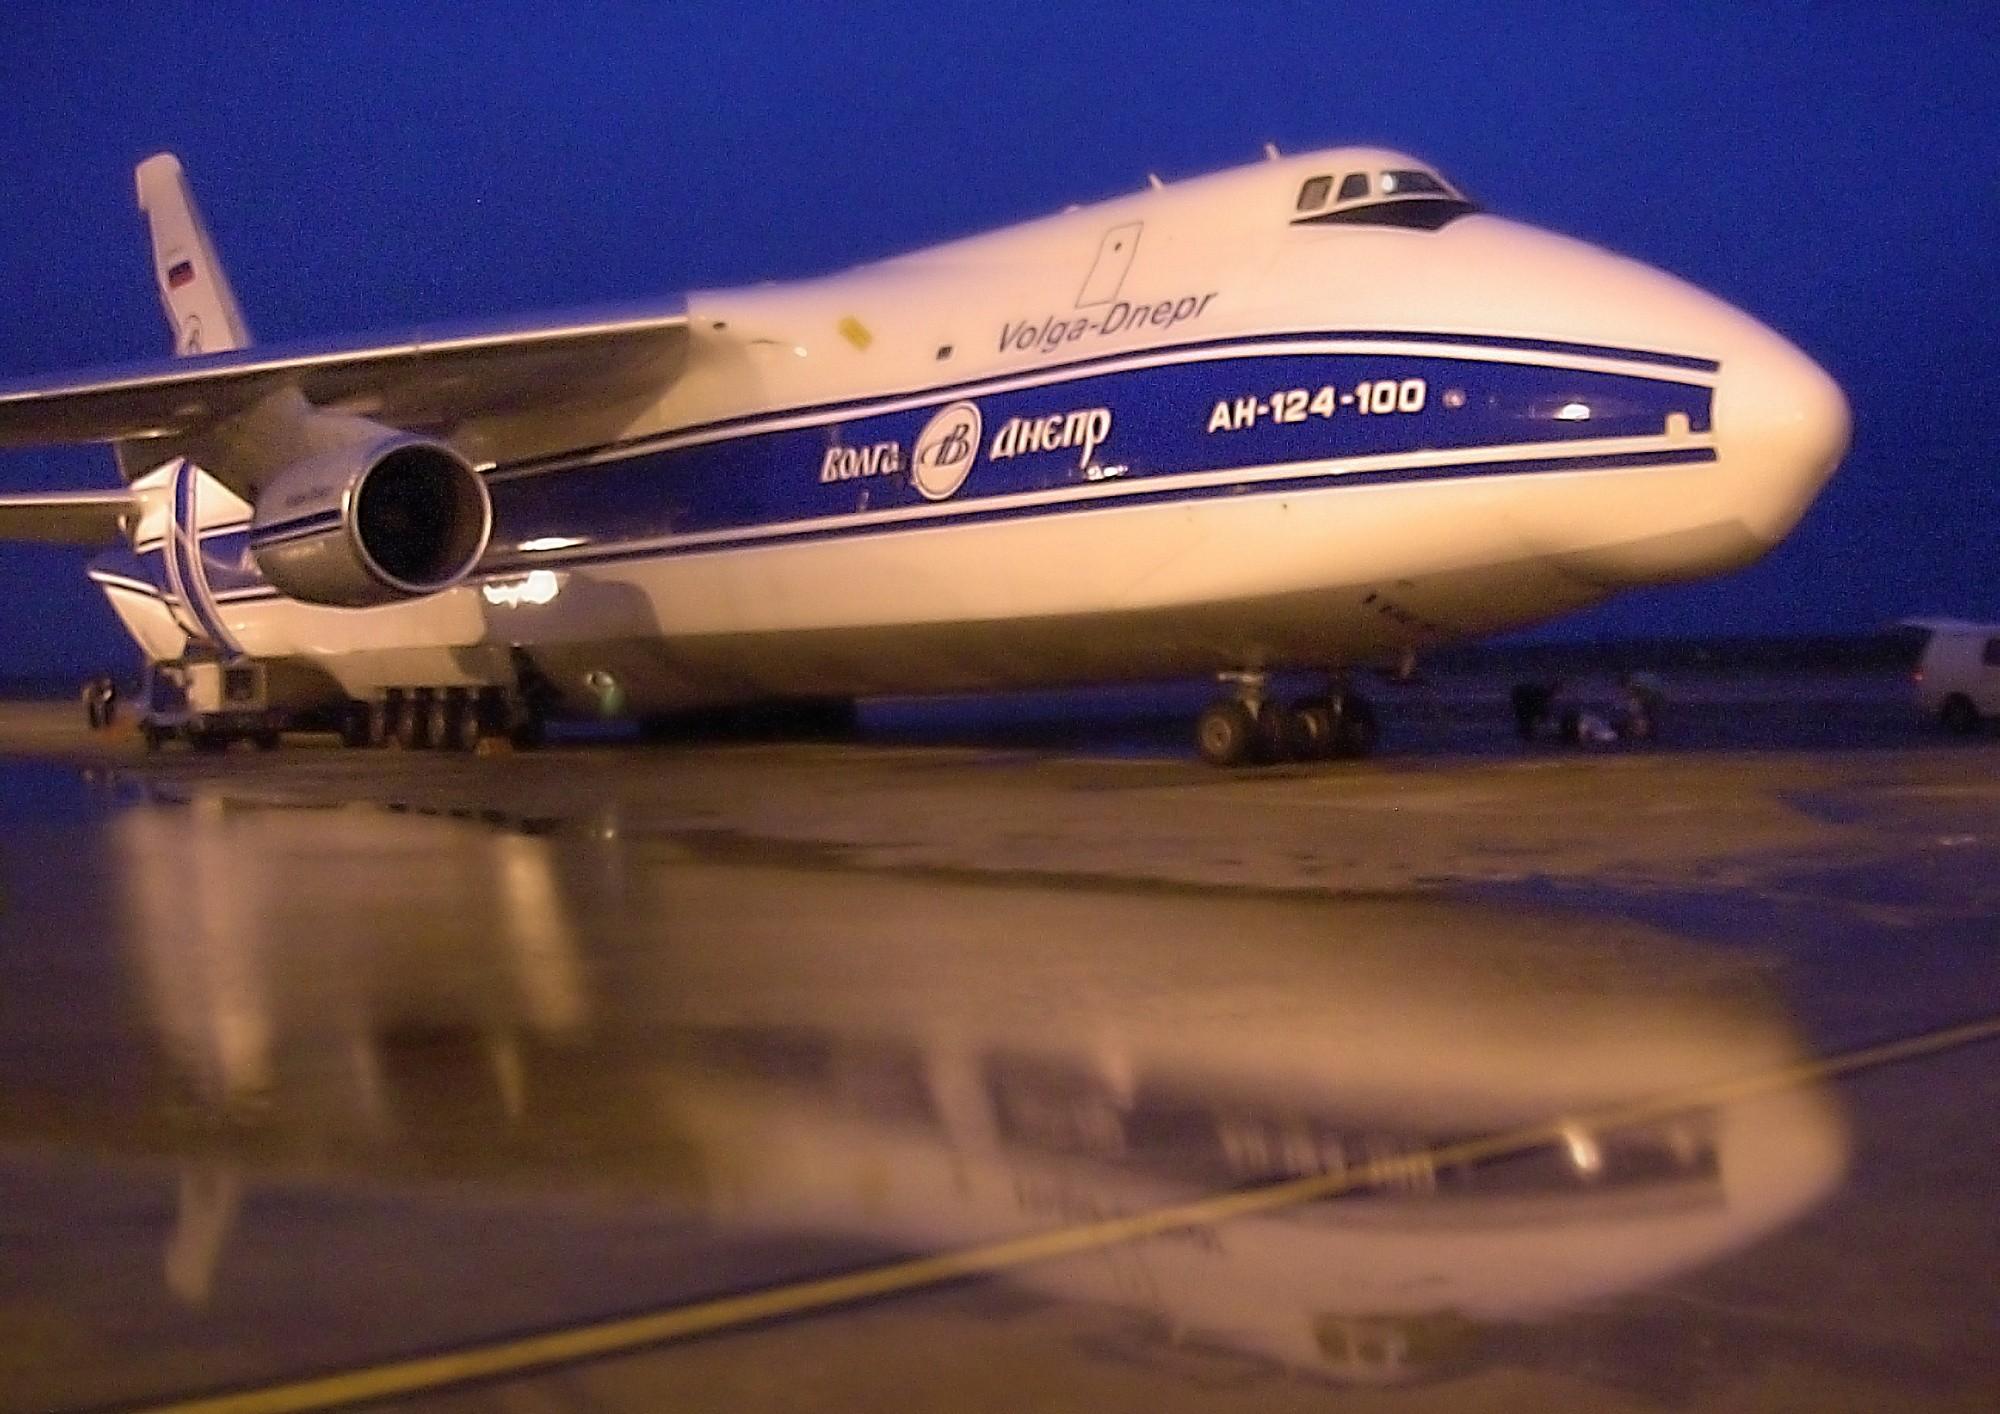 "<p>Фото © <a href=""https://airline.volga-dnepr.com/media/photo_gallery/?SECTION_ID=8"" target=""_self"">Группа компаний ""Волга-Днепр""</a></p>"